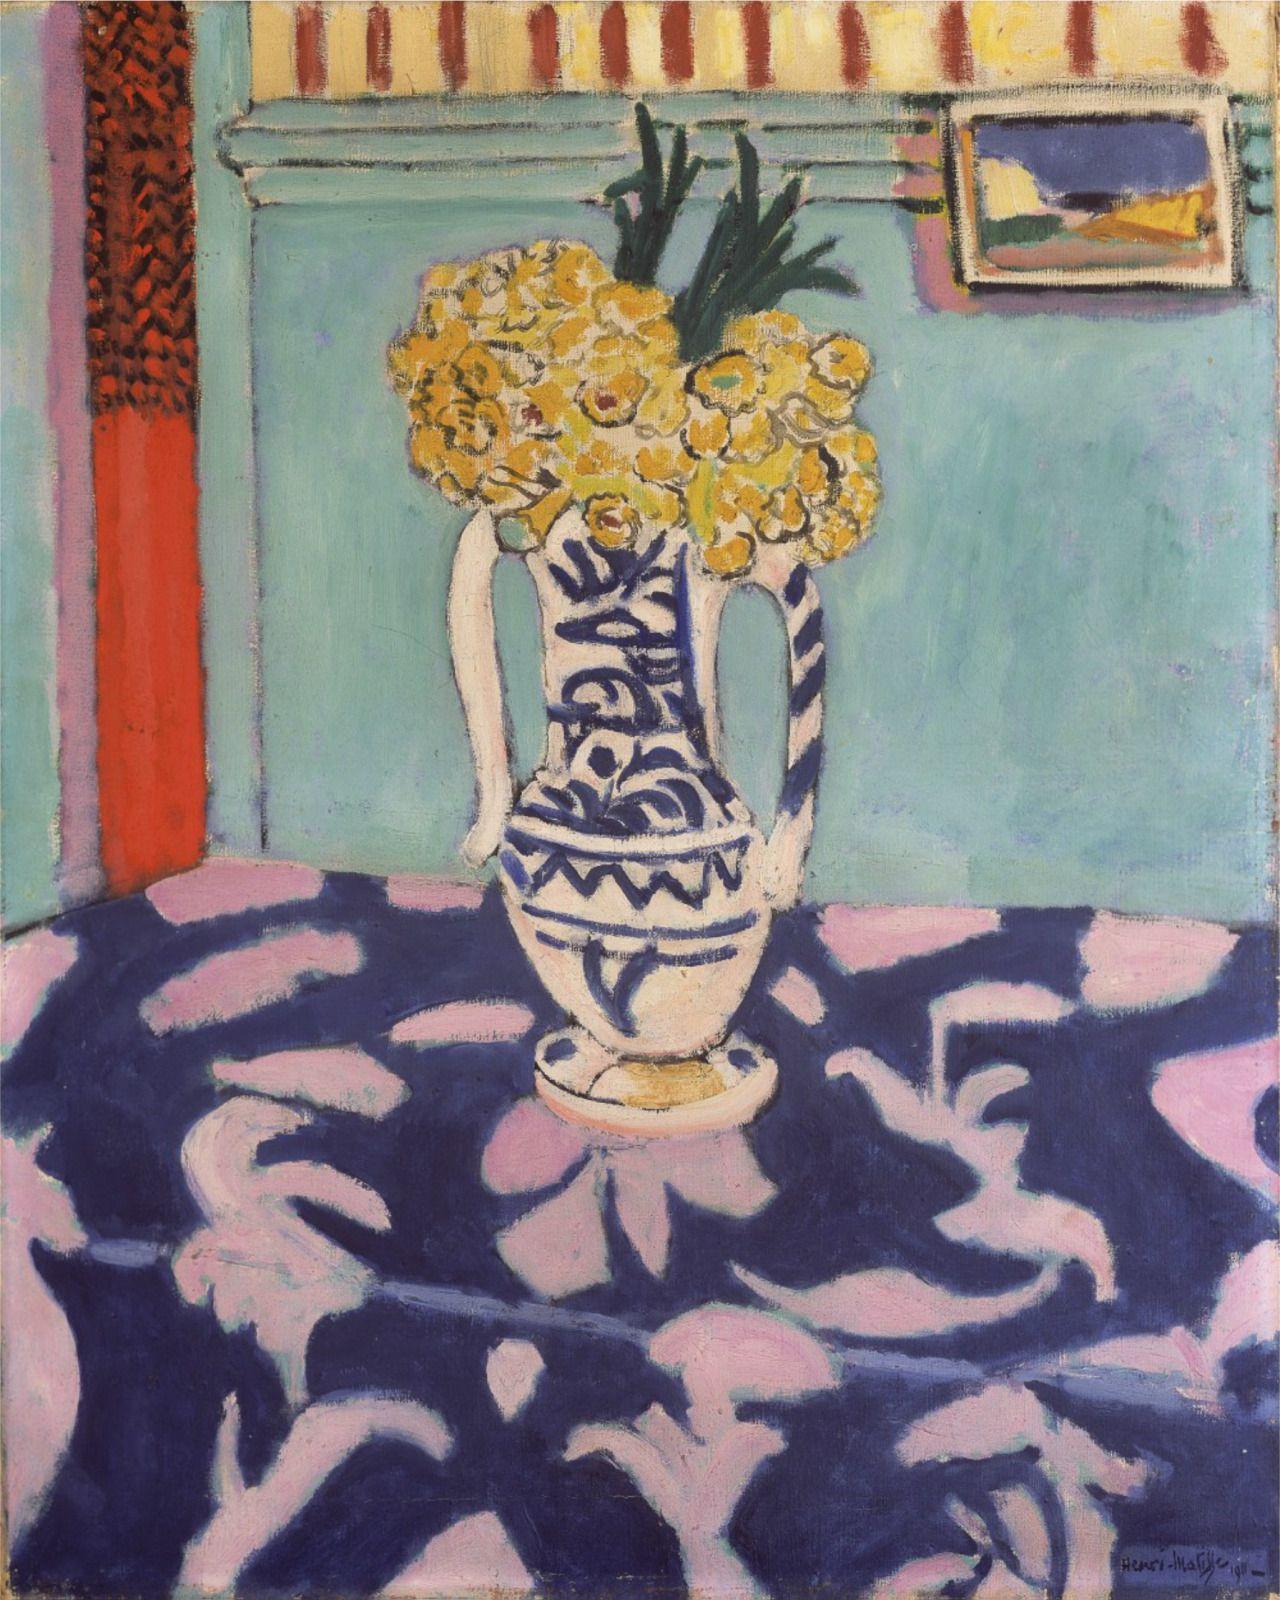 les coucous tapis bleu et rose 1911 henri matisse scrapbook no 29 pinterest. Black Bedroom Furniture Sets. Home Design Ideas